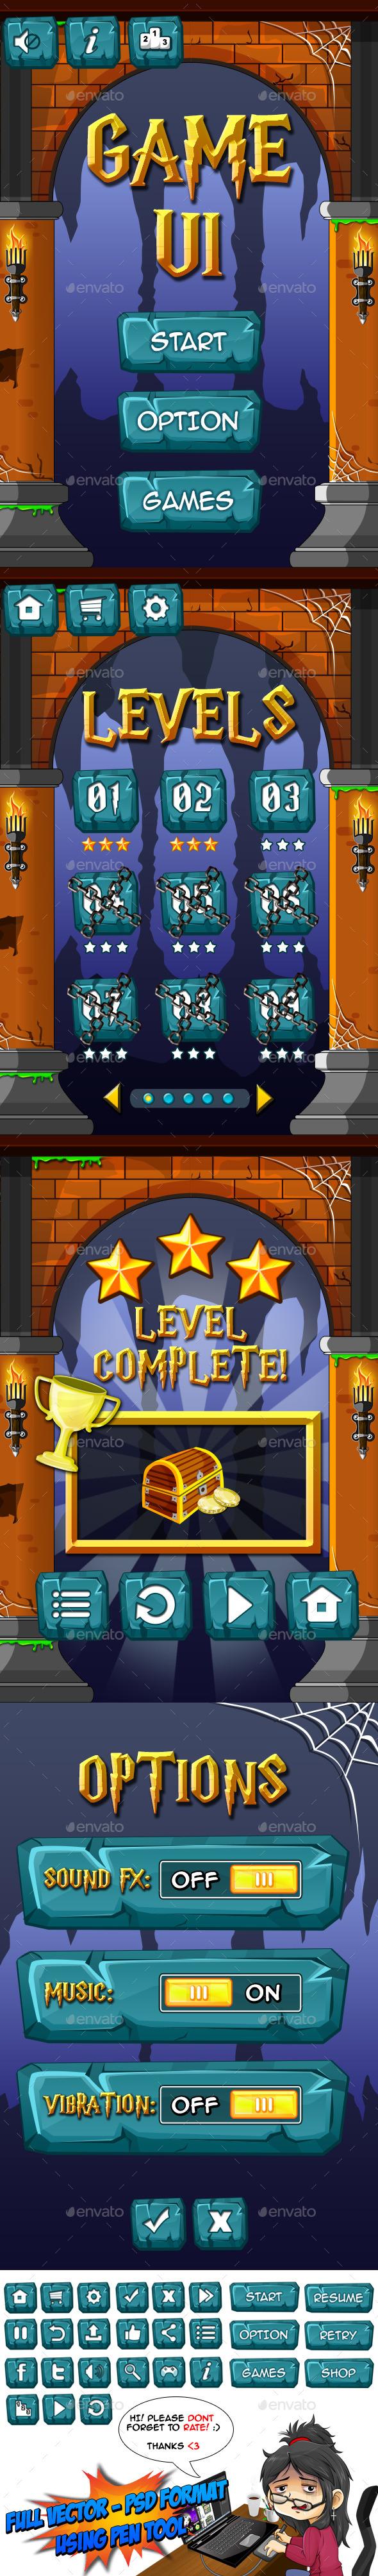 GraphicRiver Game UI 2 11363868